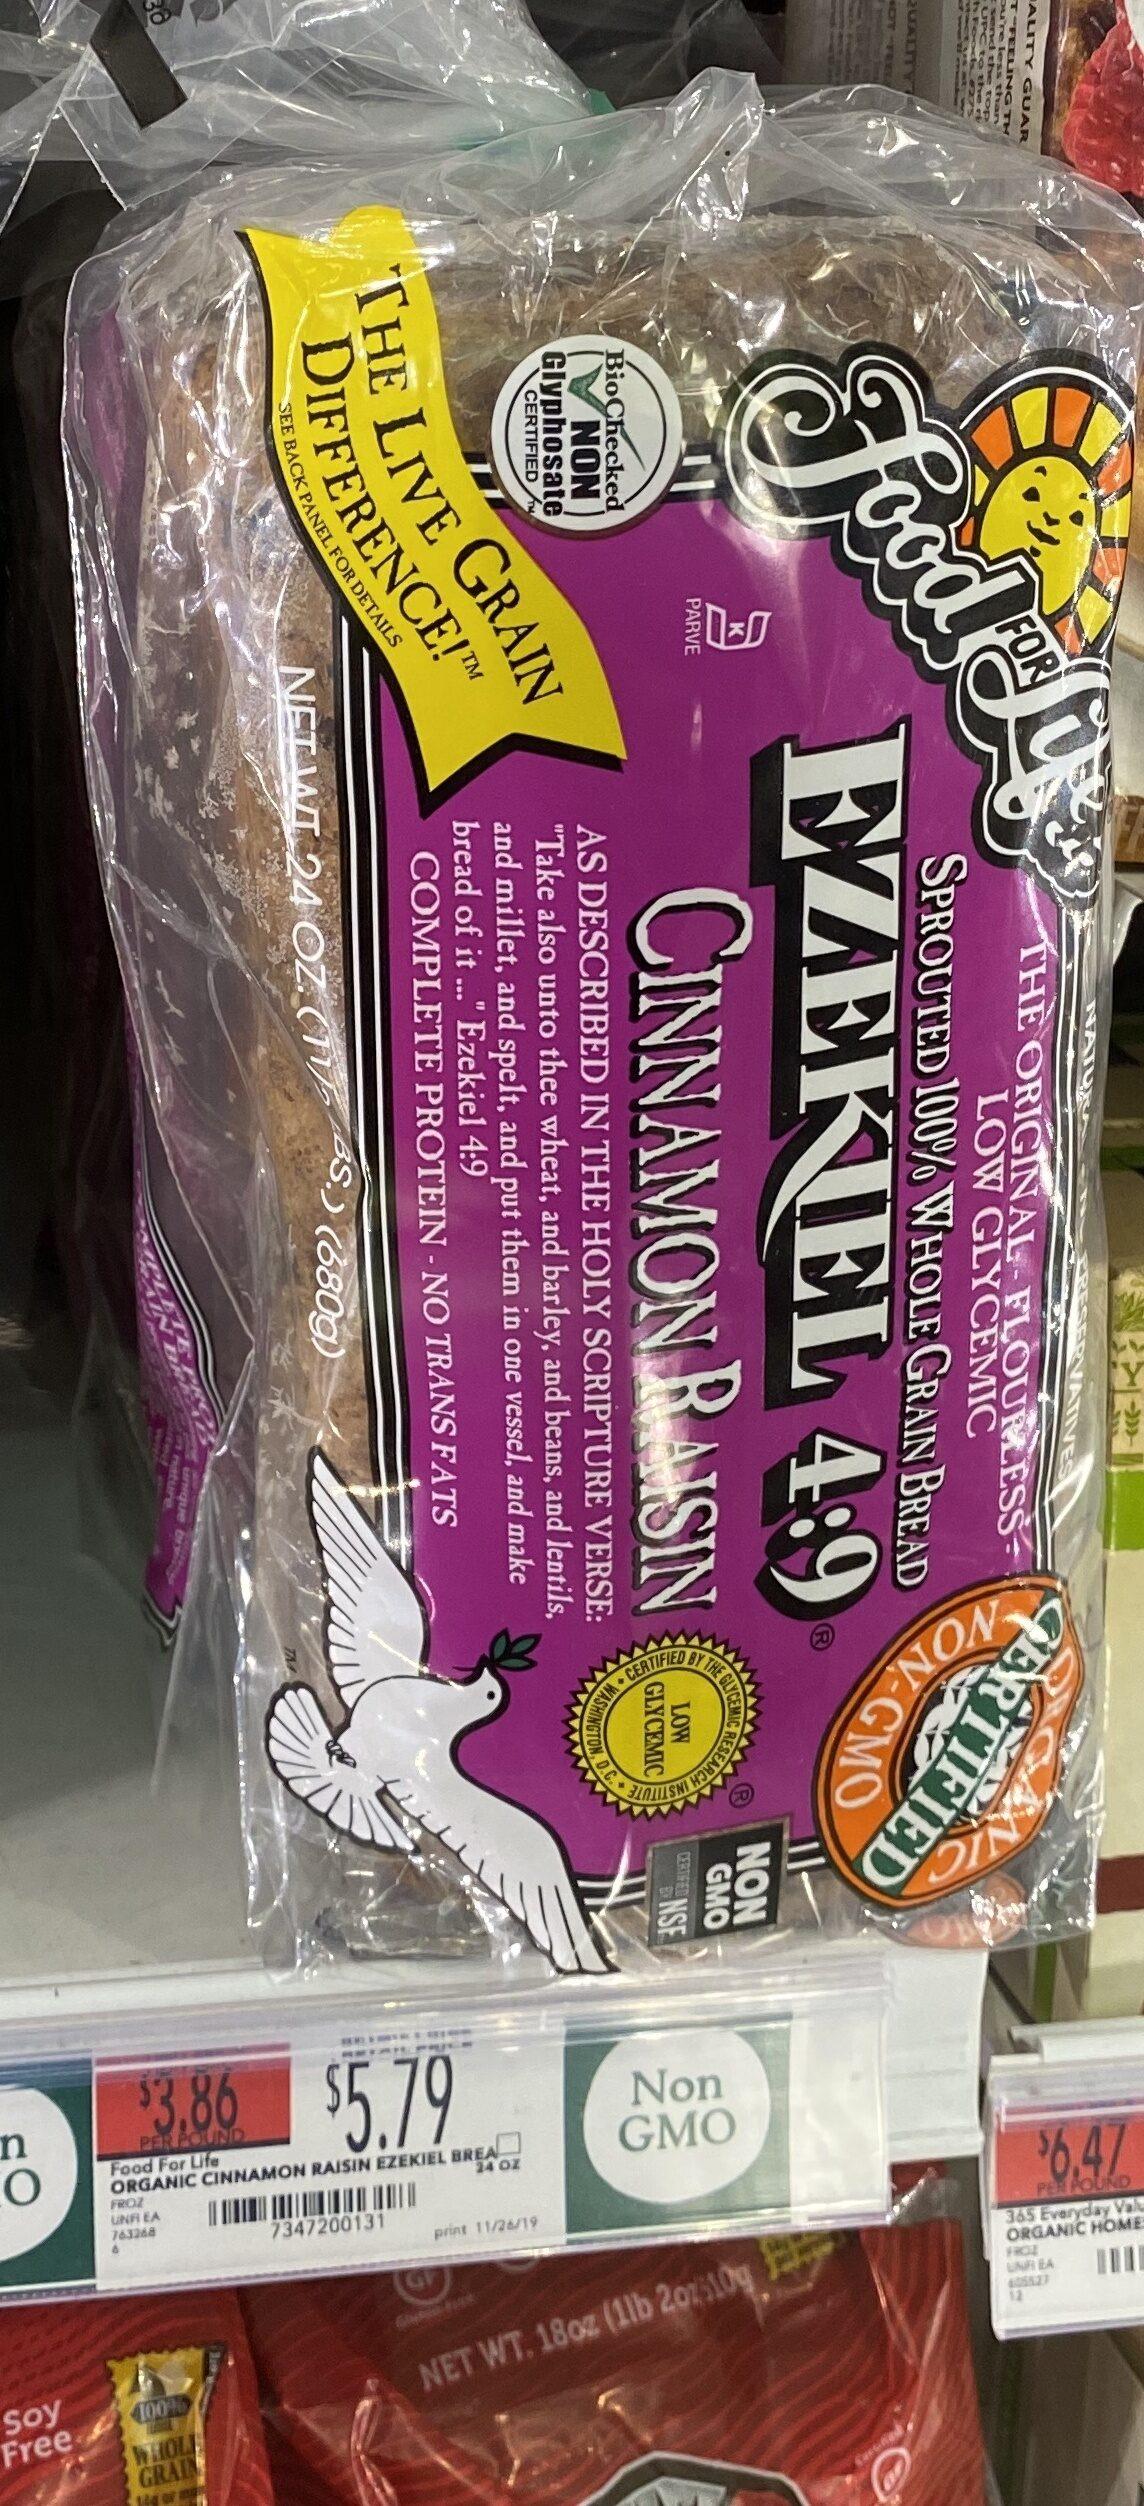 Ezekiel 4:9, Low Sodium Sprouted Grain Bread, Original - Product - en